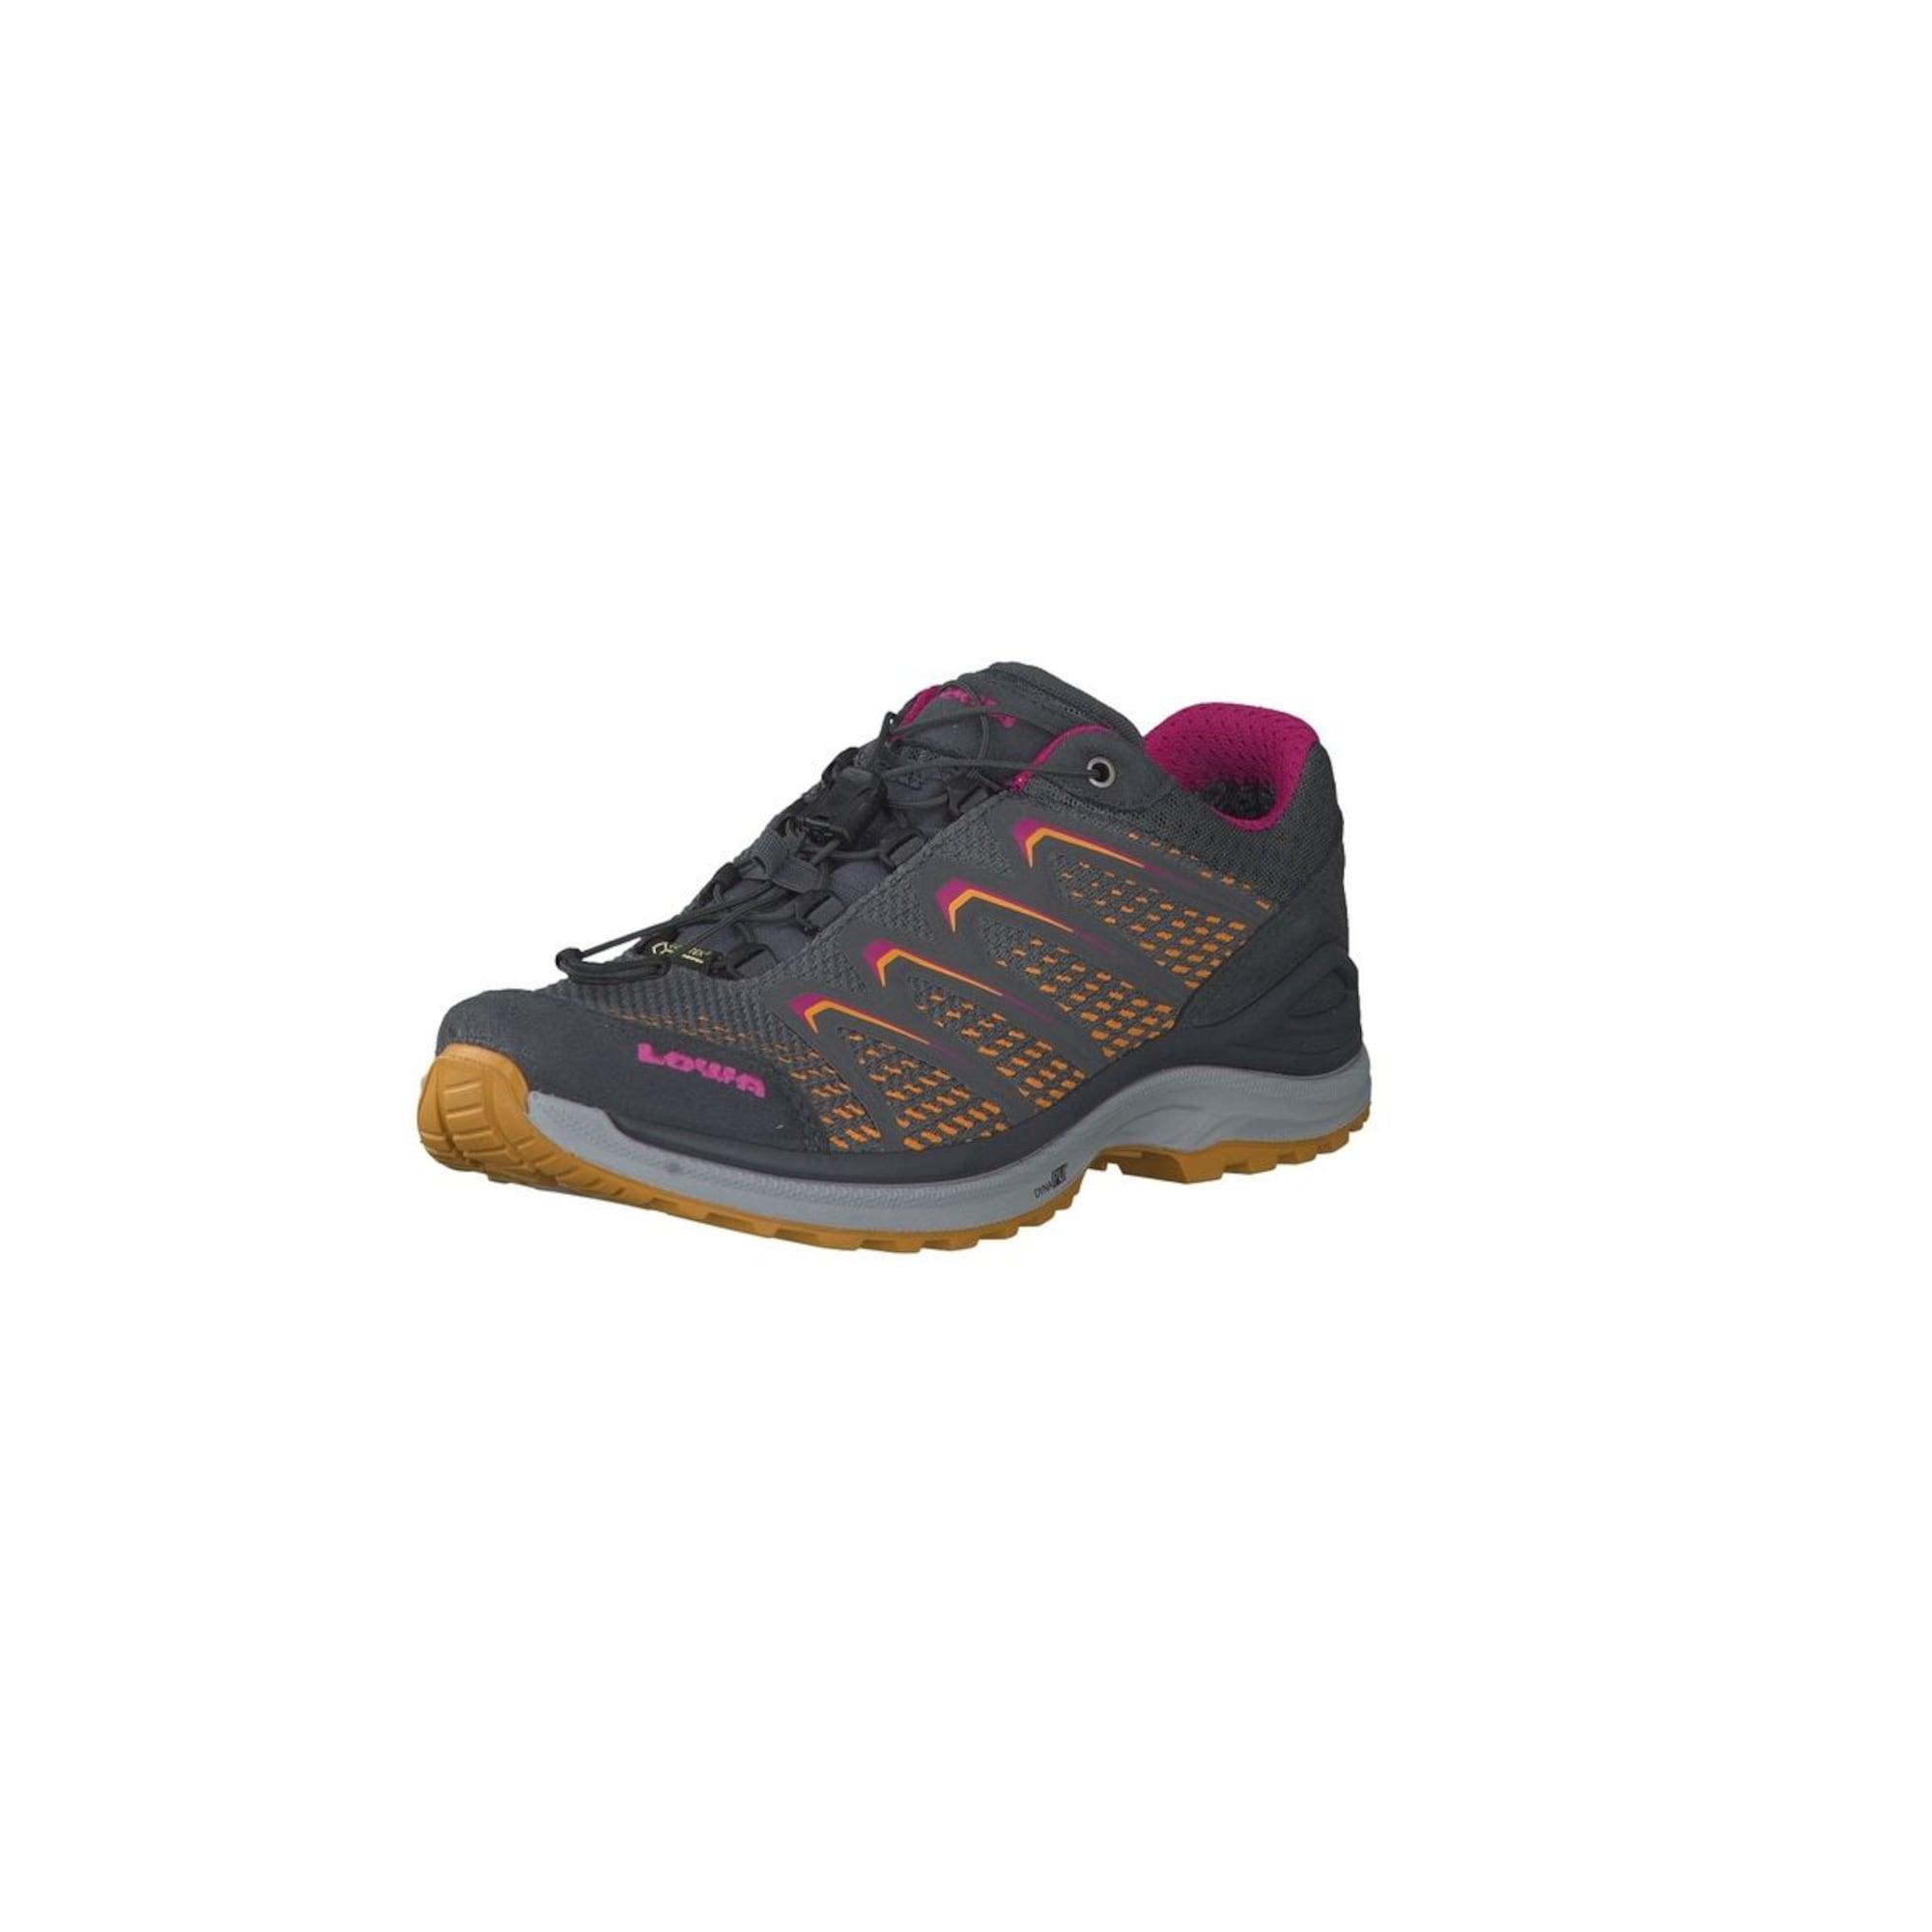 Outdoorschuhe | Schuhe > Outdoorschuhe | Dunkelgrau - Pink | LOWA